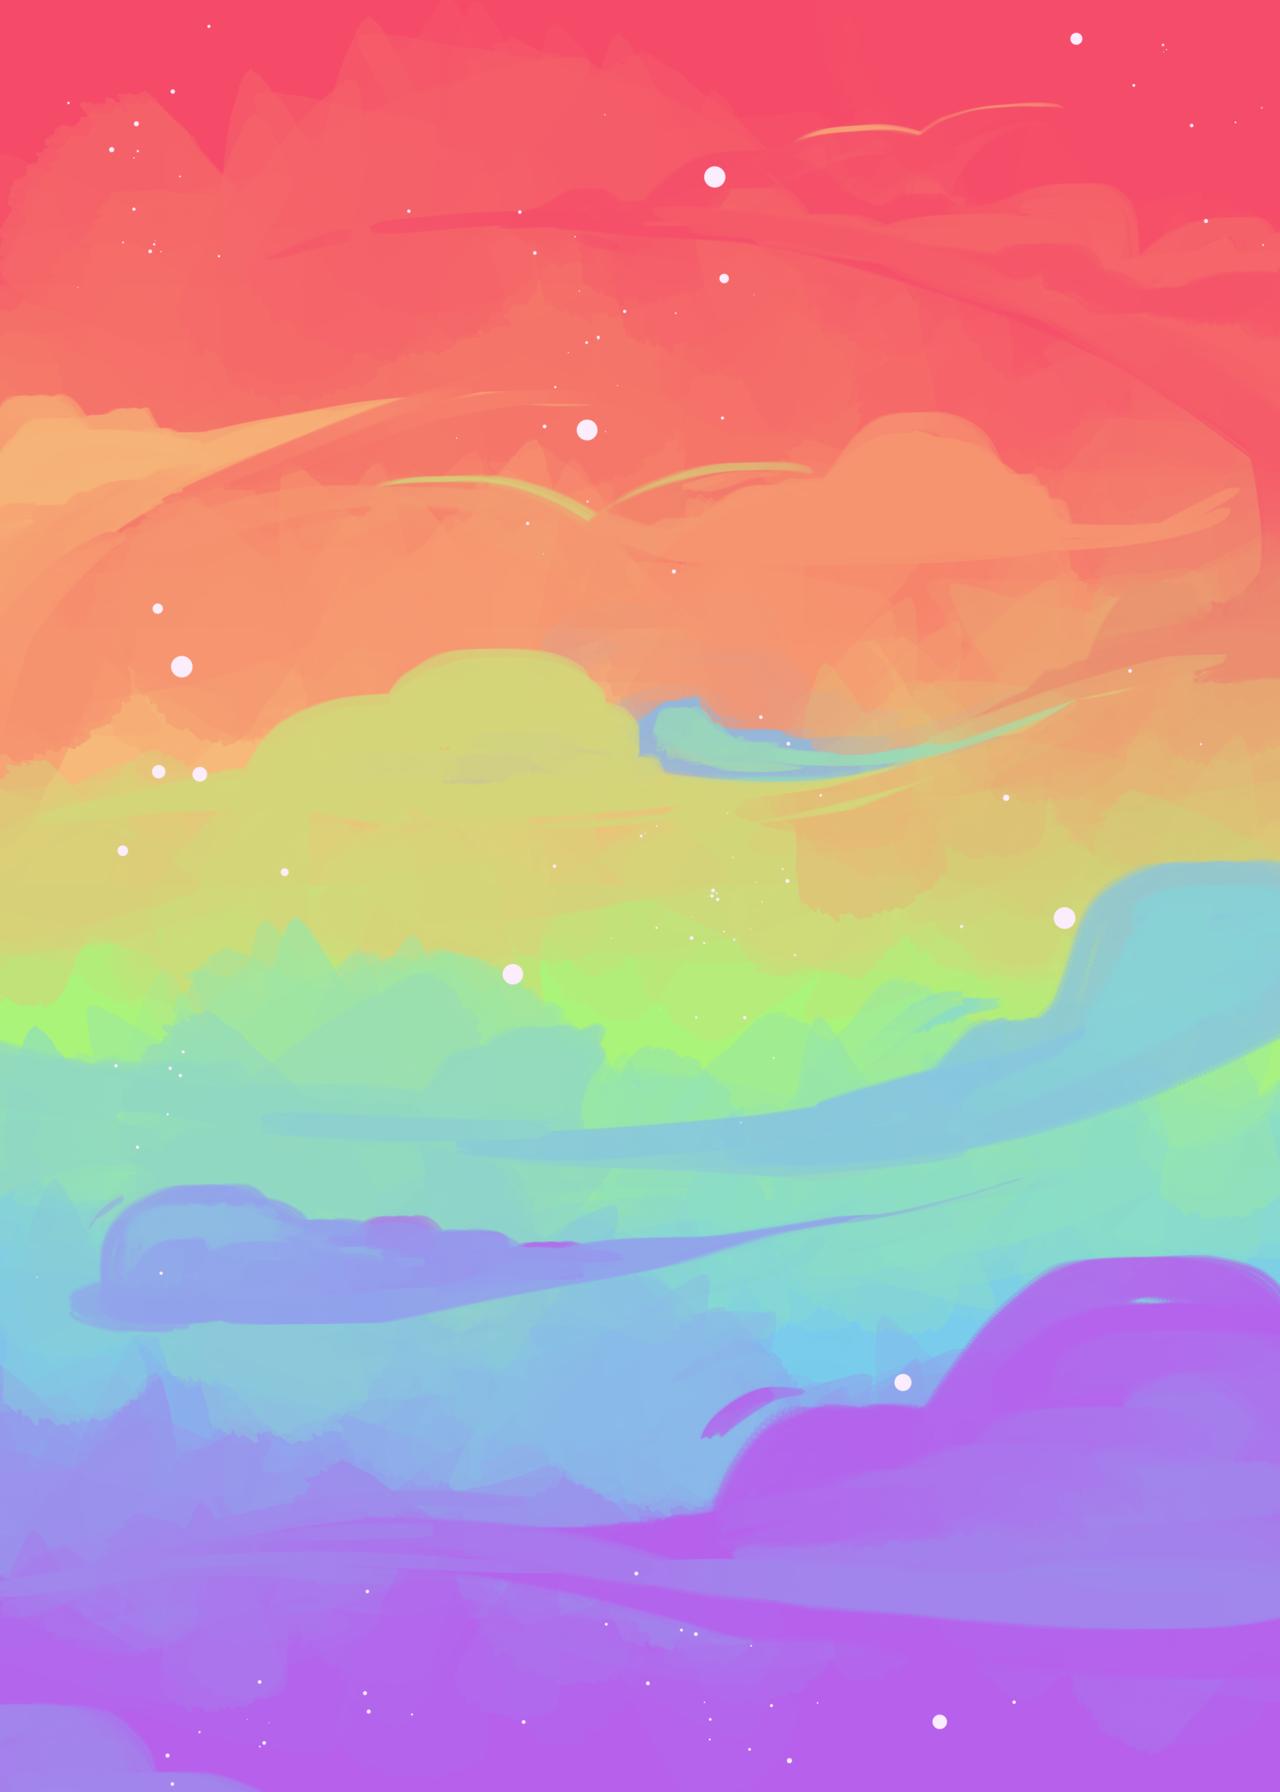 Rainbow Rain With Images Minimalist Desktop Wallpaper